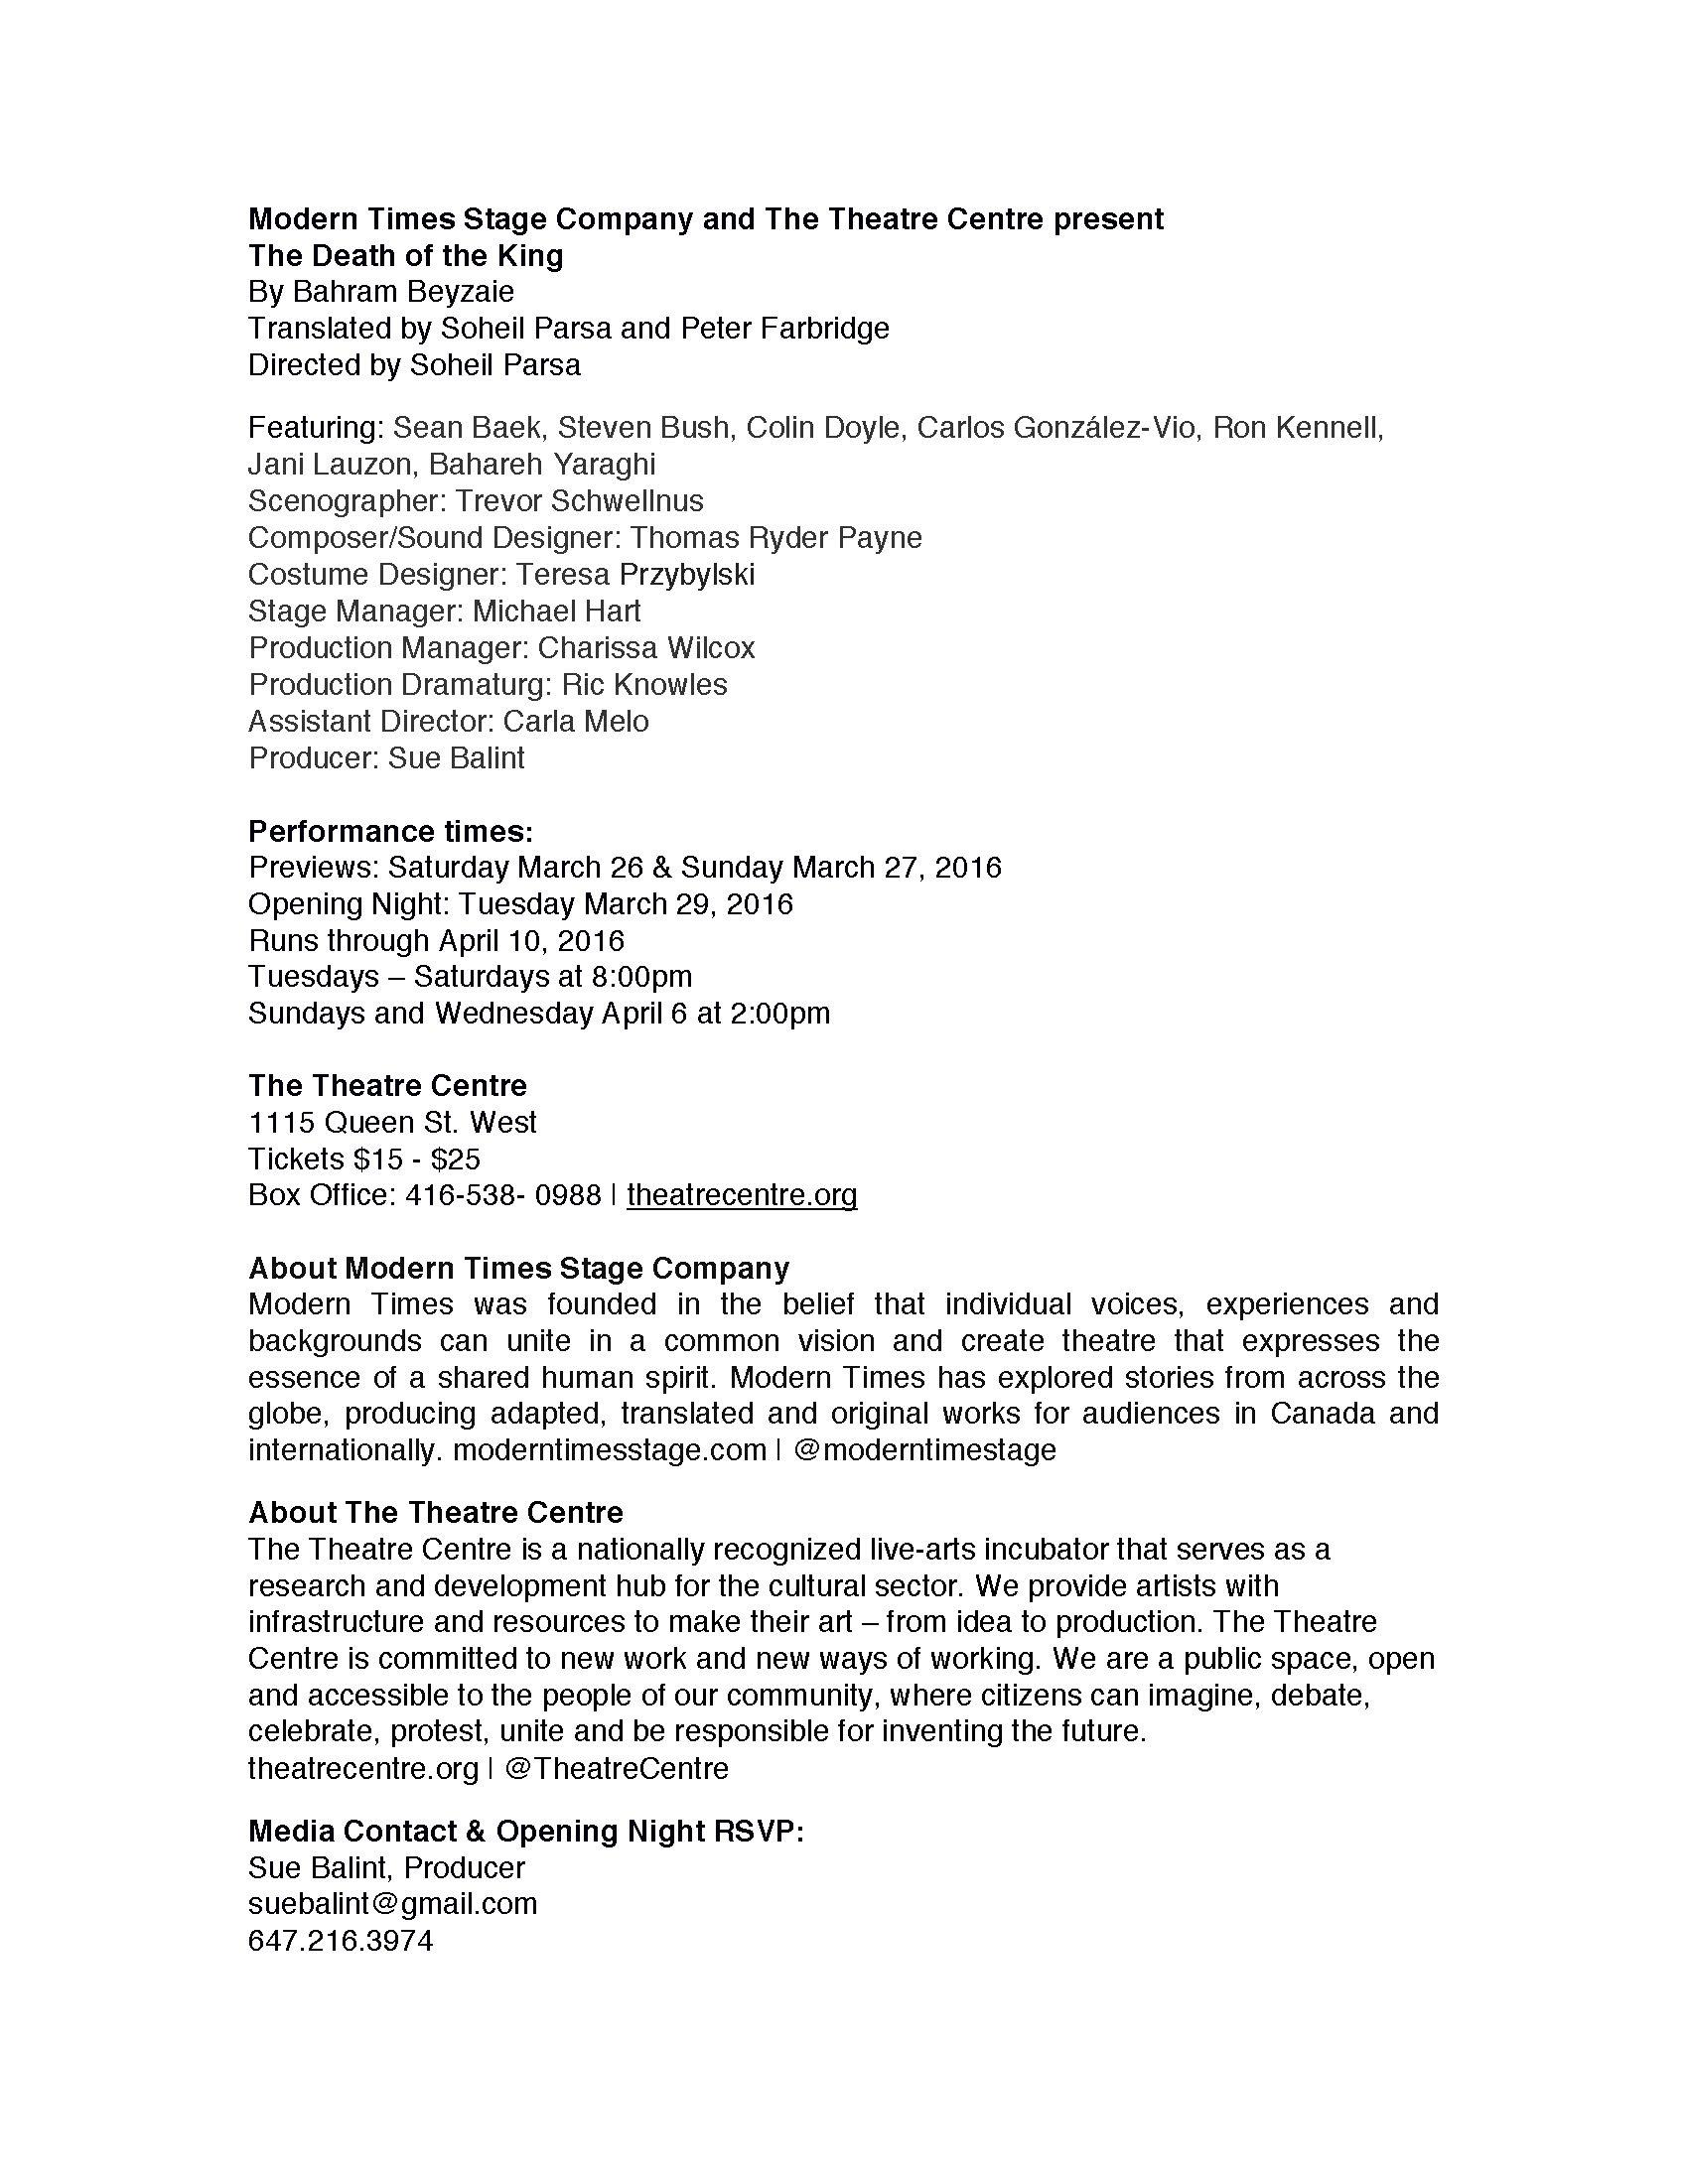 DotK press release_Page_2